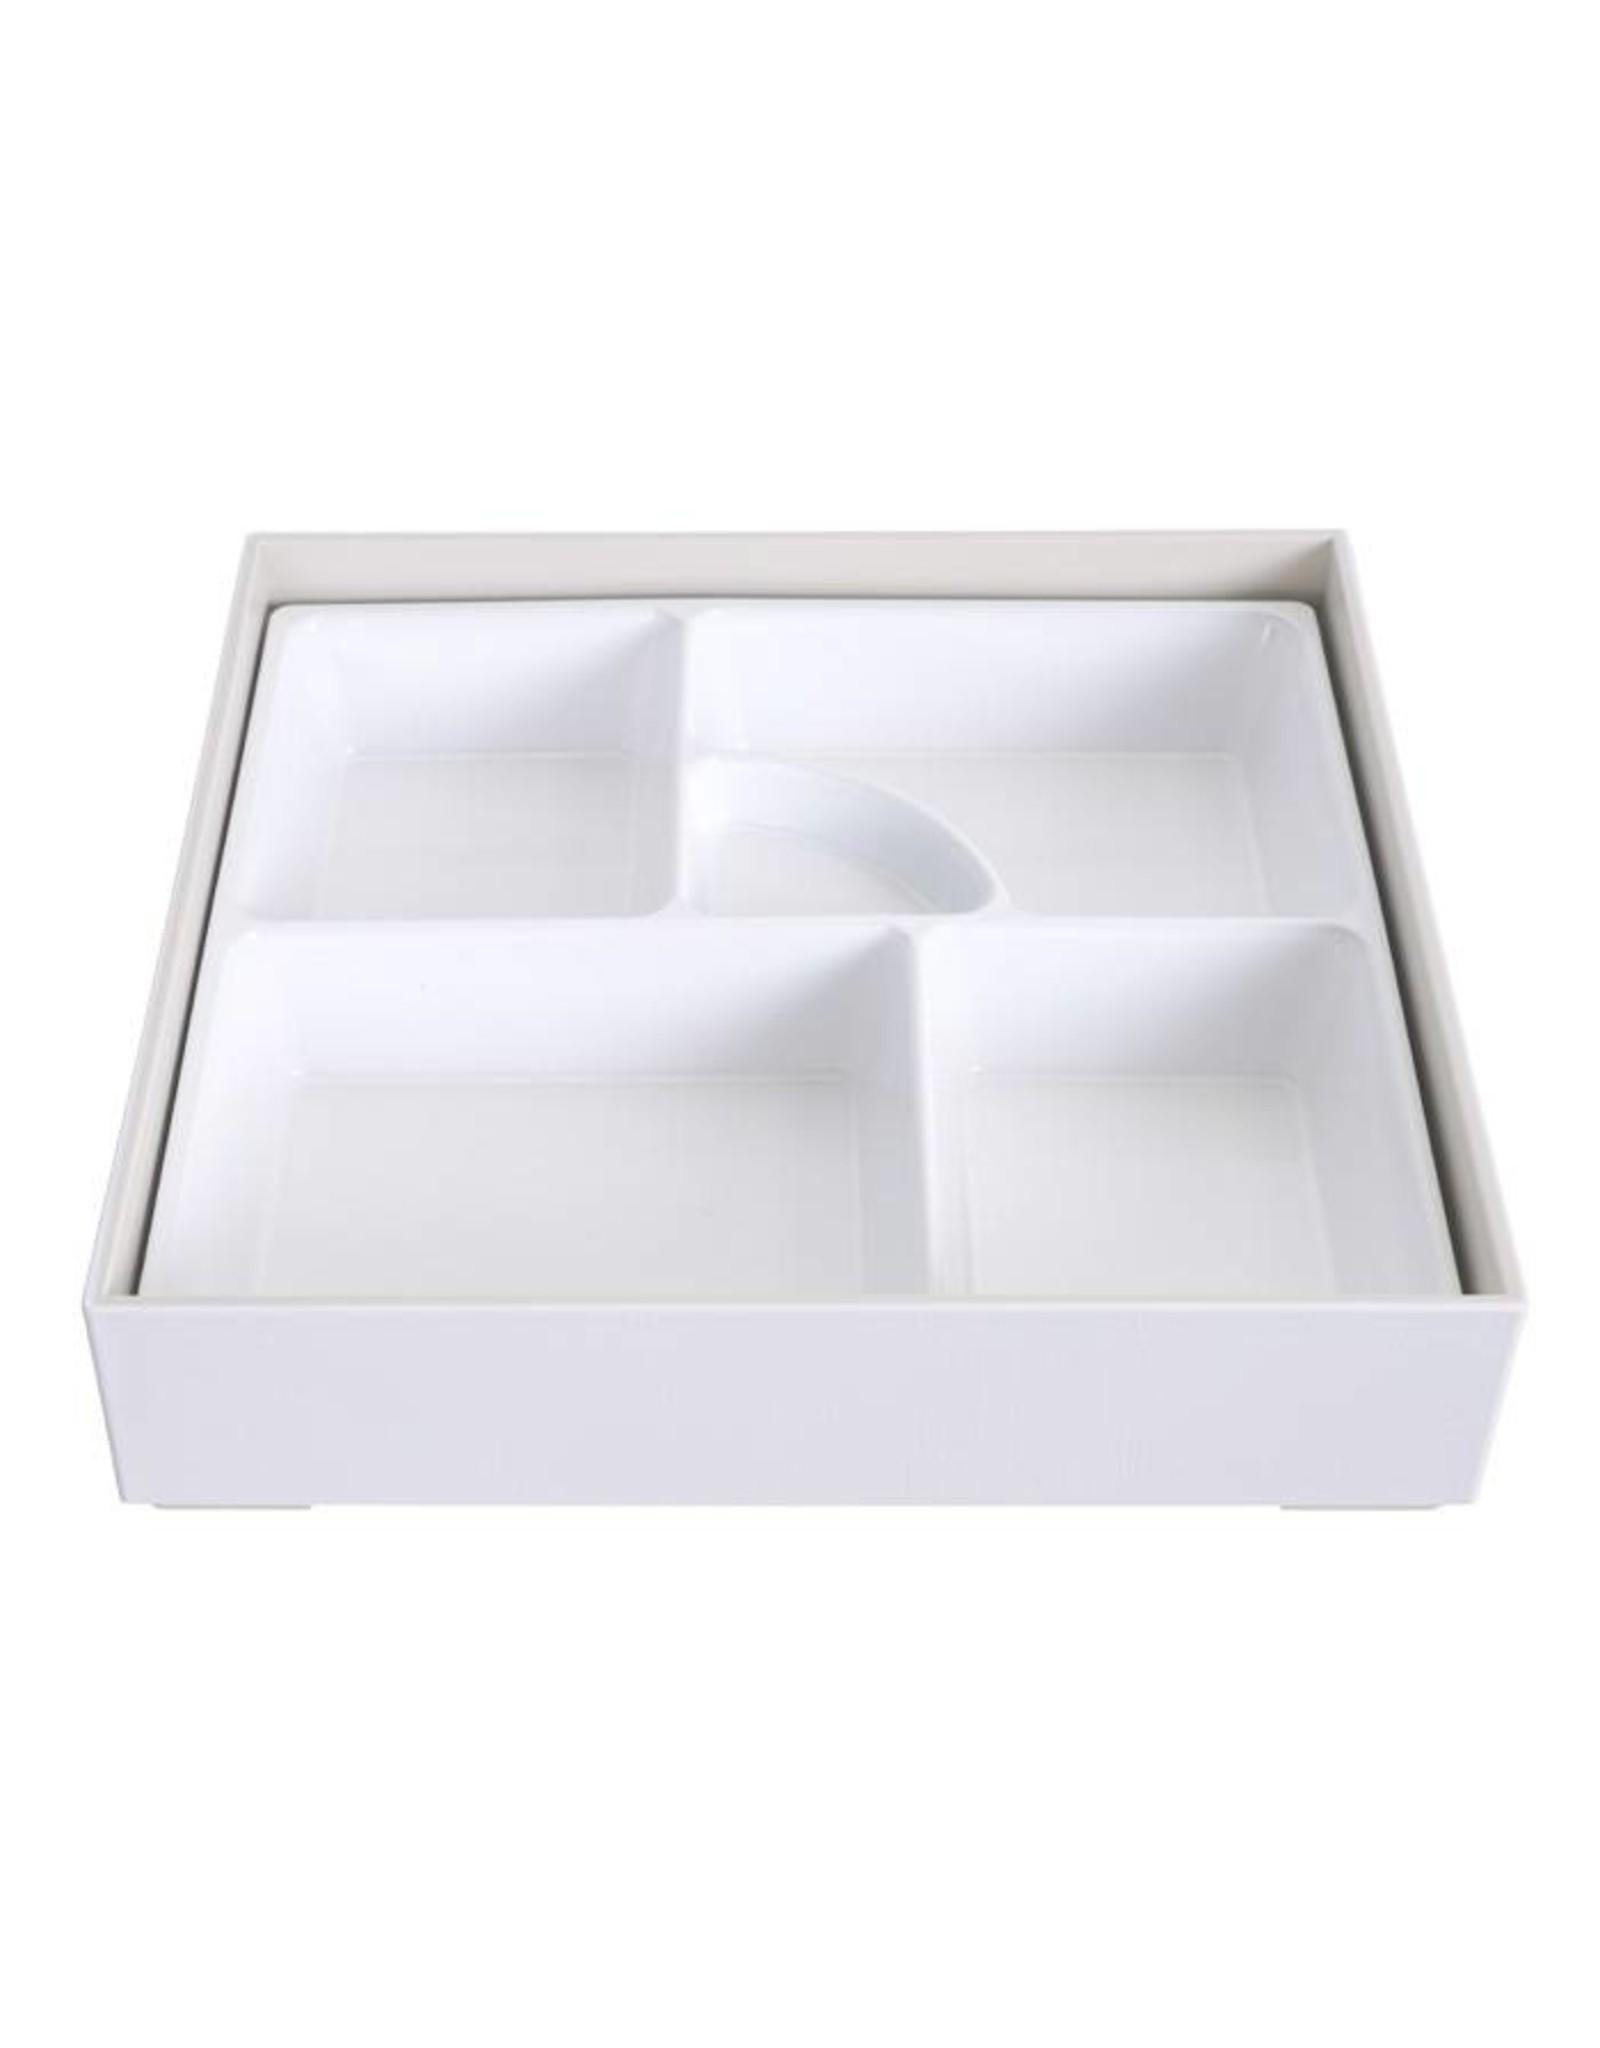 Tokyo Design Studio ABS Lacquerware Bento Box 25.5x25.5cm wit